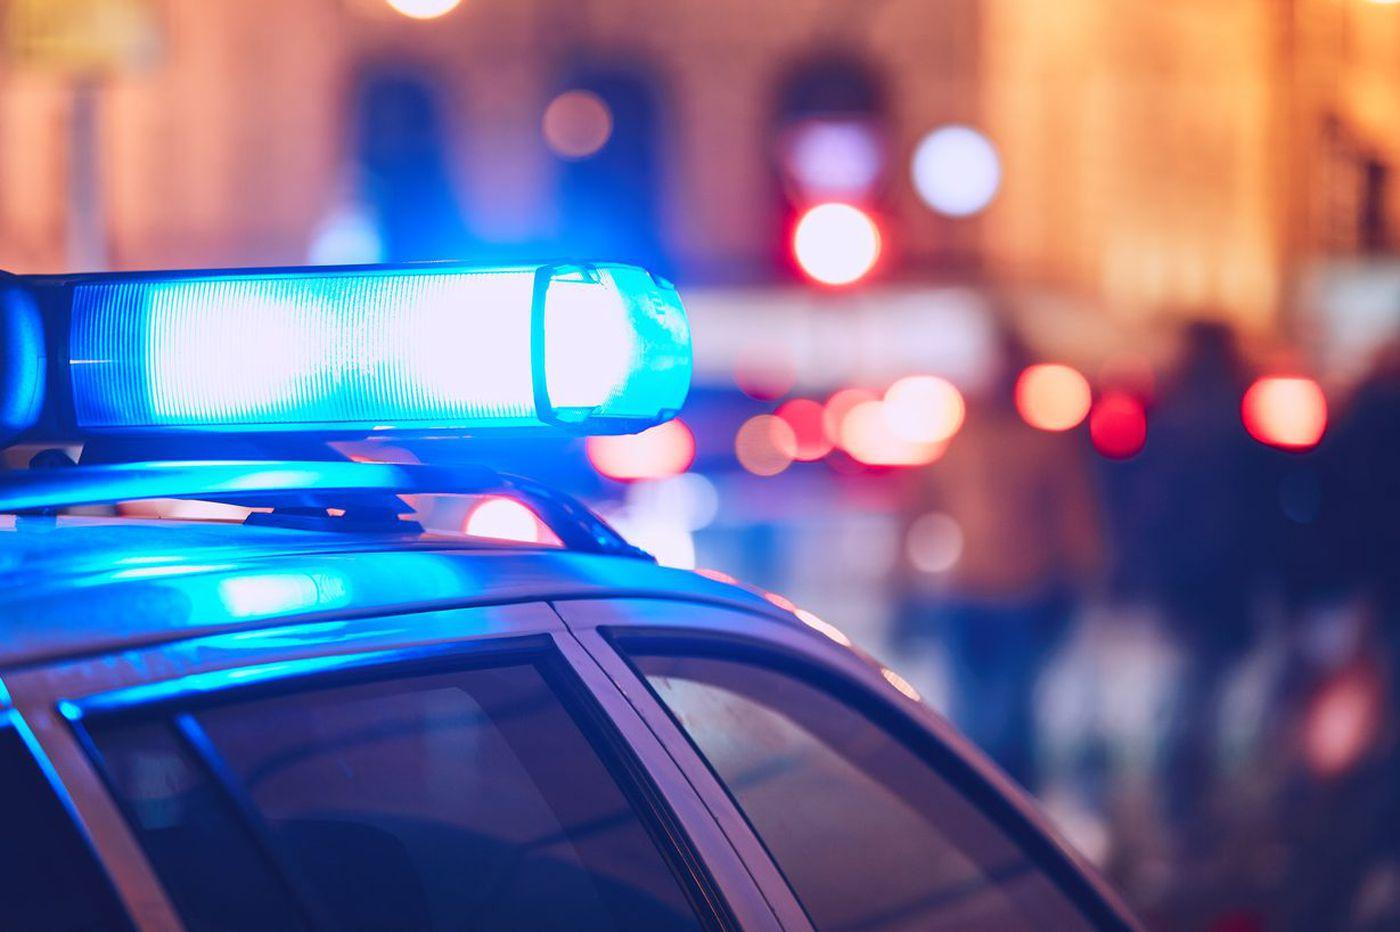 Philadelphia man killed in Cheltenham in apparent road rage shooting